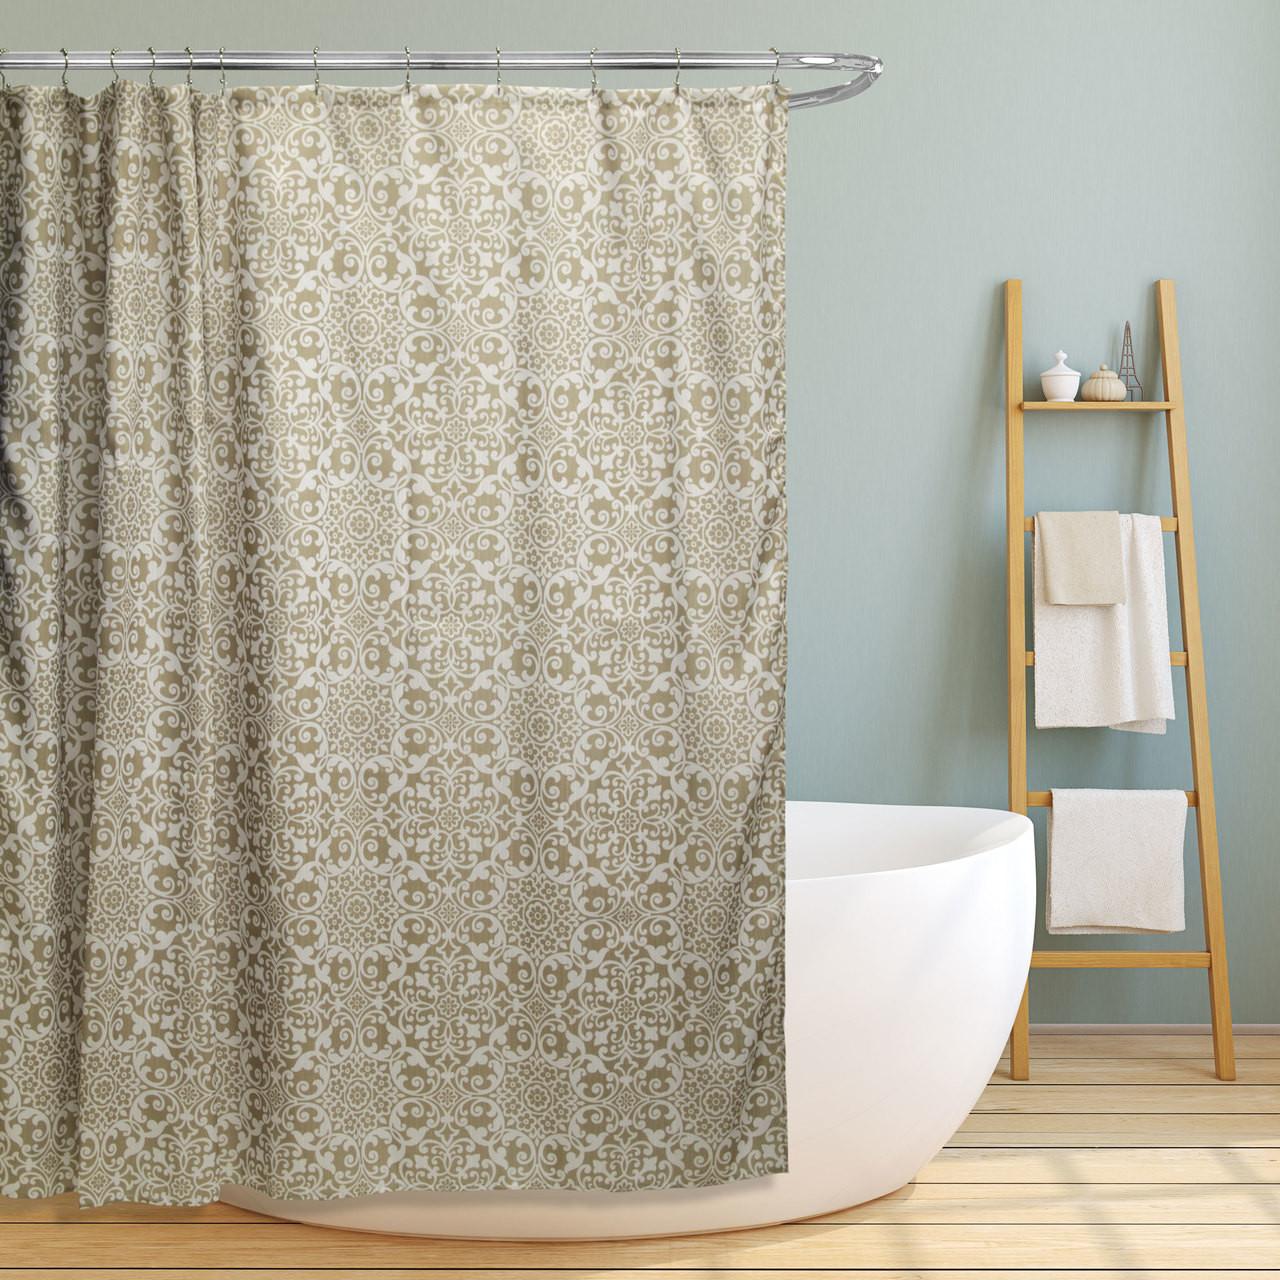 Linen Store Fabric Canvas Shower Curtain 70 X70 Lori Floral Scroll Geometric Design